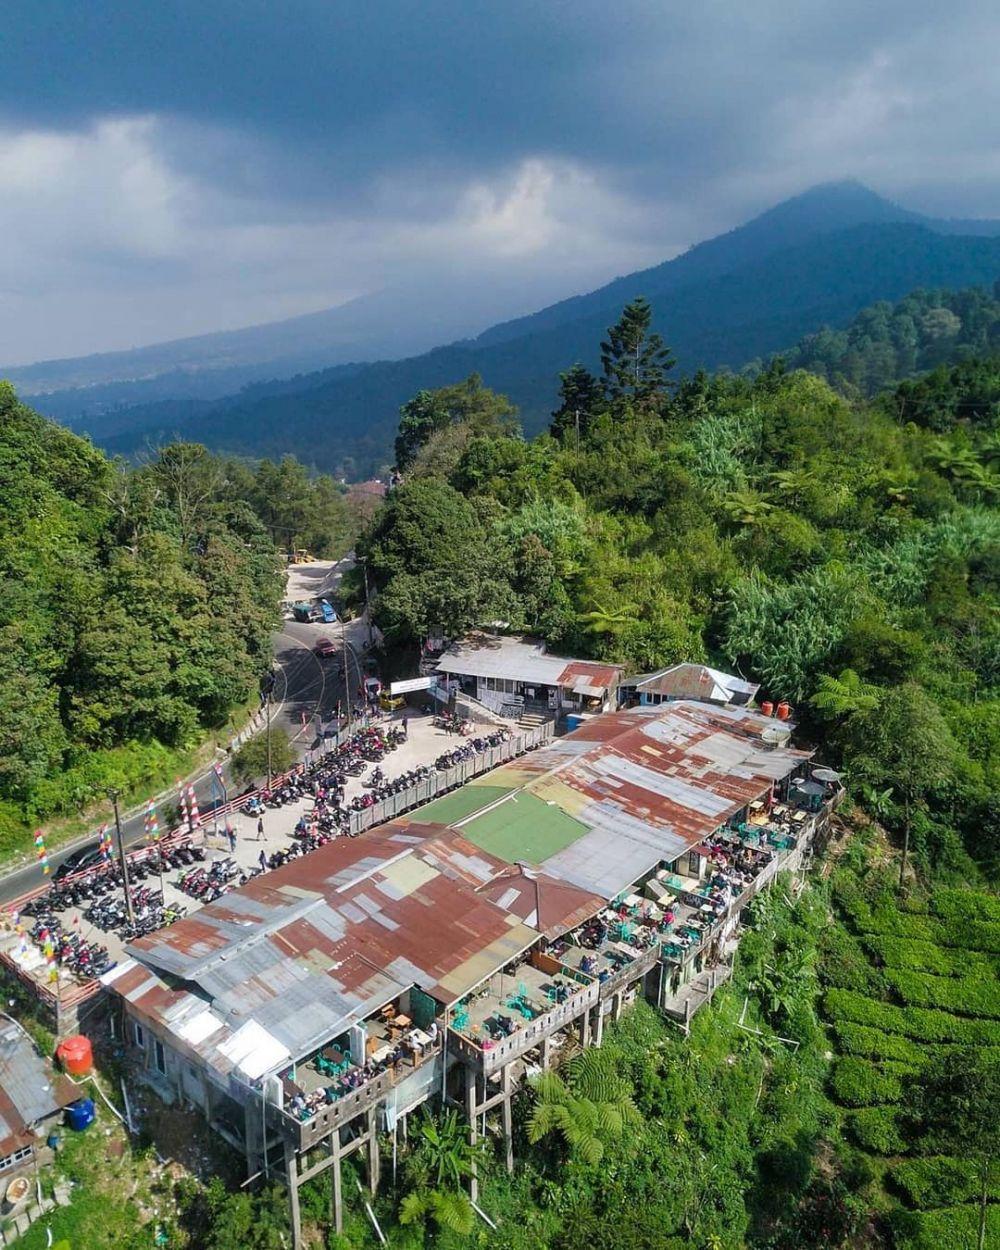 7 Tempat Nongkrong Asik di Cianjur, Ada yang Menyatu dengan Alam